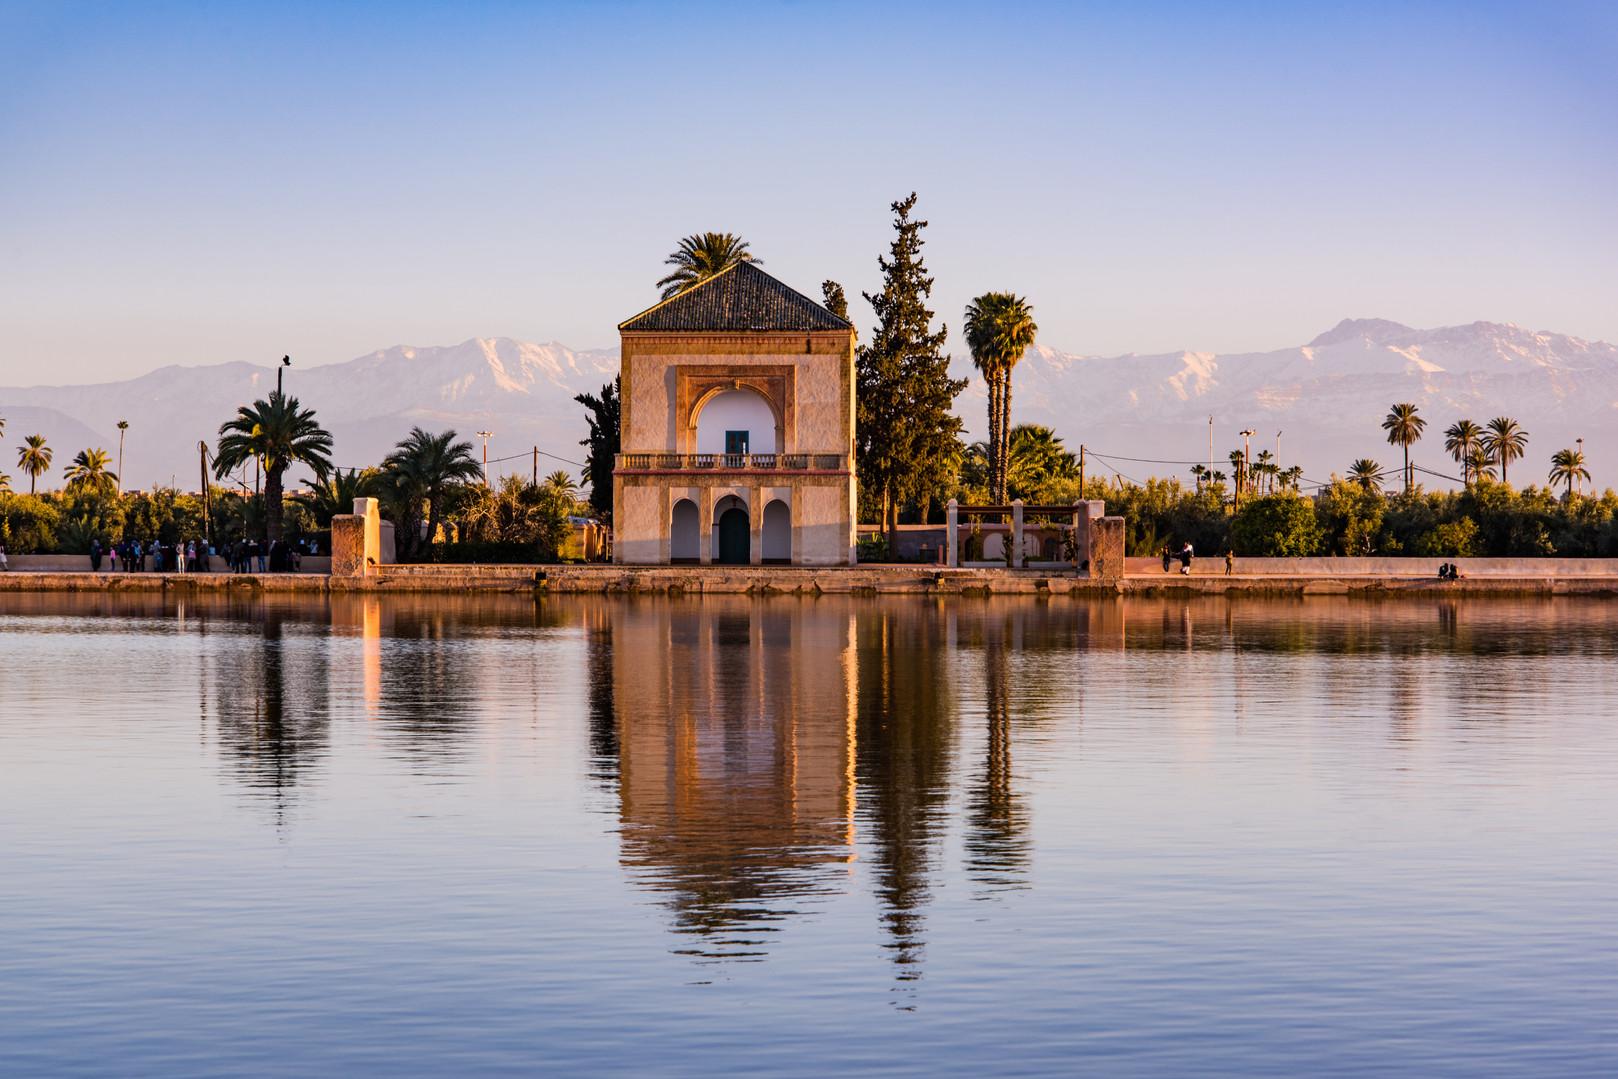 saadian-pavilion-menara-gardens-and-atla